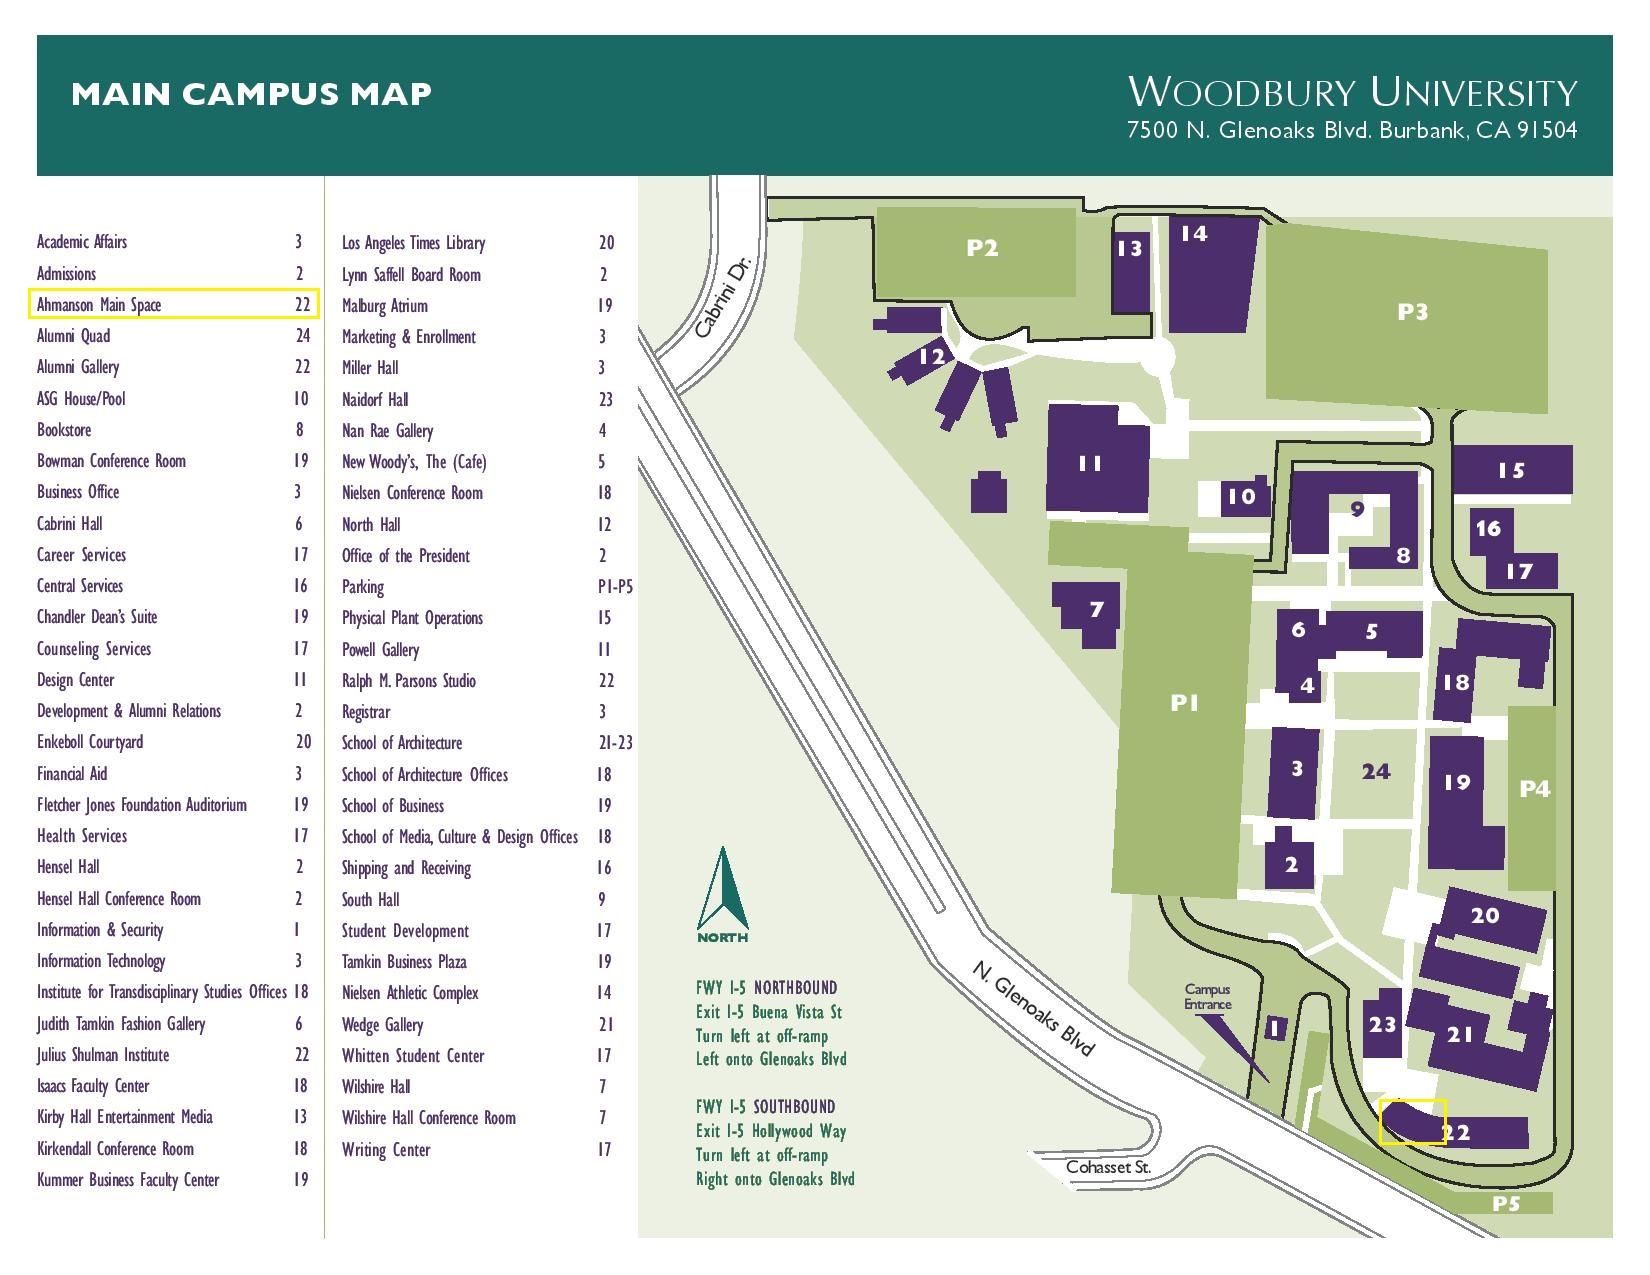 Cabrini College Campus Map.Ccsu Campus Map Map Of Tourist Attractions In London Georgia